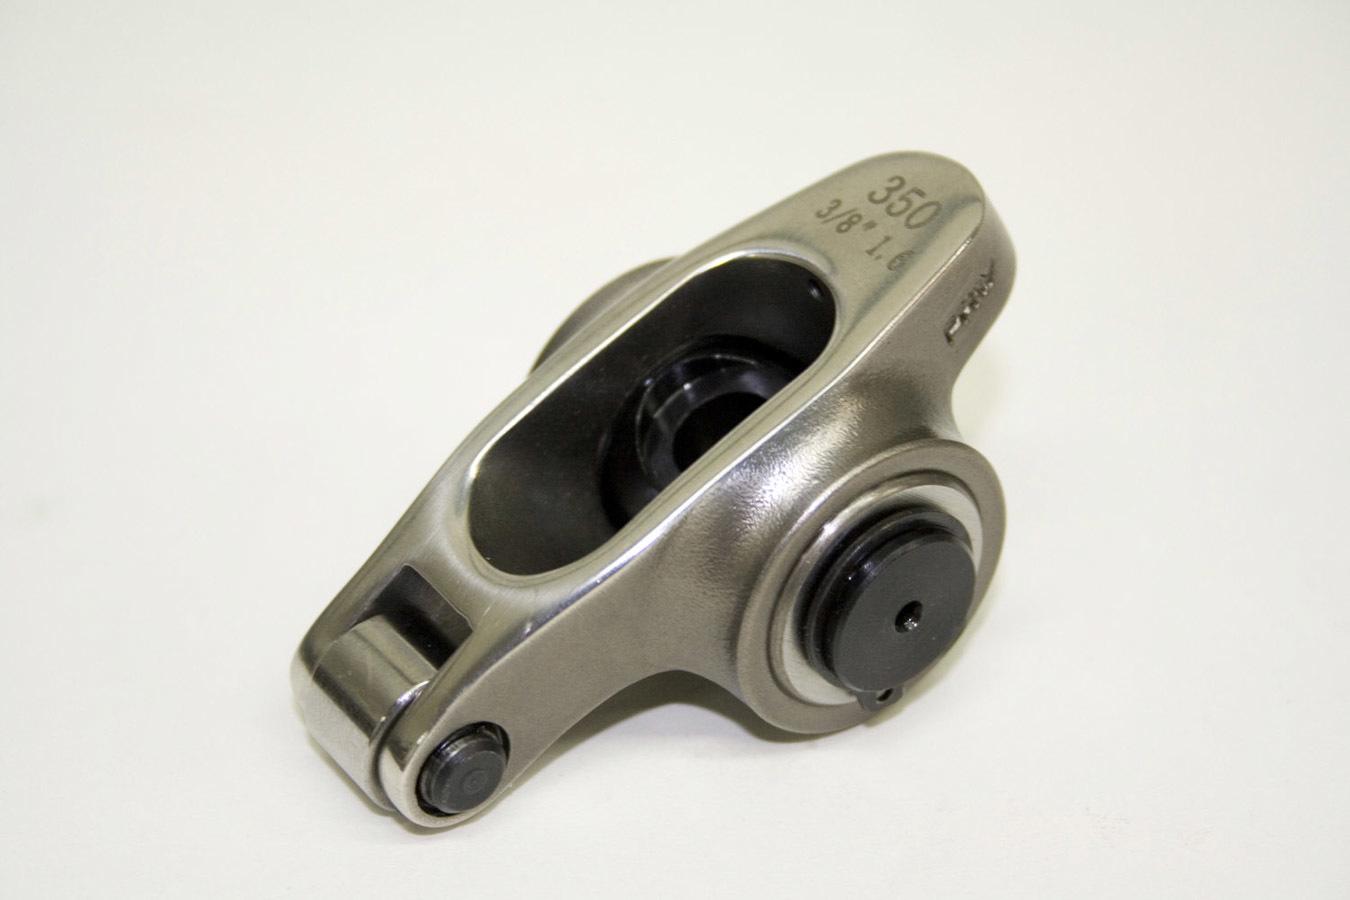 SBC S/S Roller R/A's - 1.5 Ratio 3/8 Stud